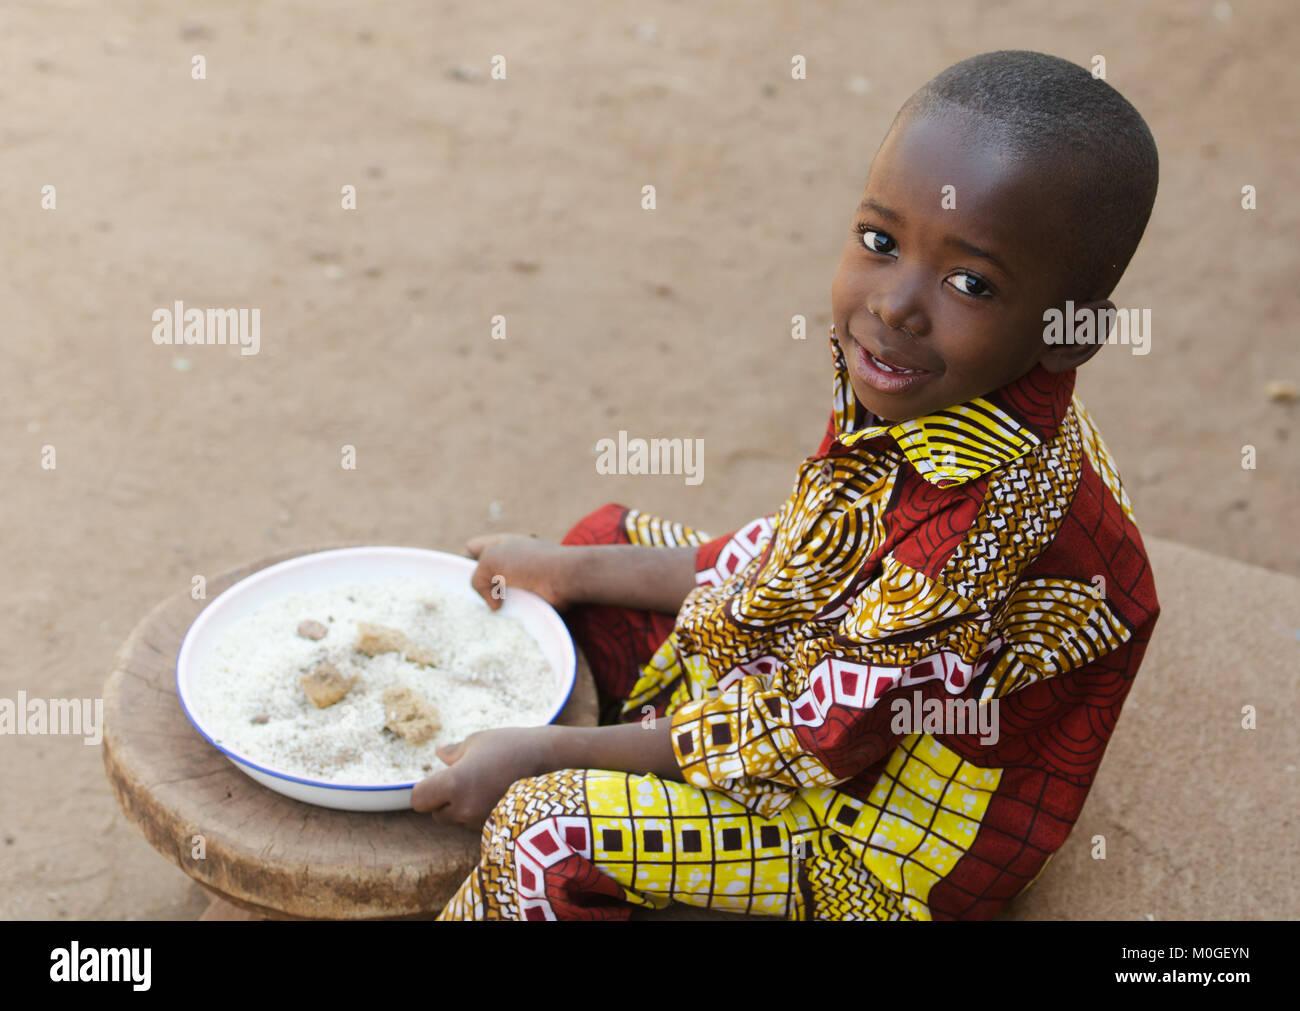 Eating in Africa - Little Black Boy Hunger Symbol - Stock Image